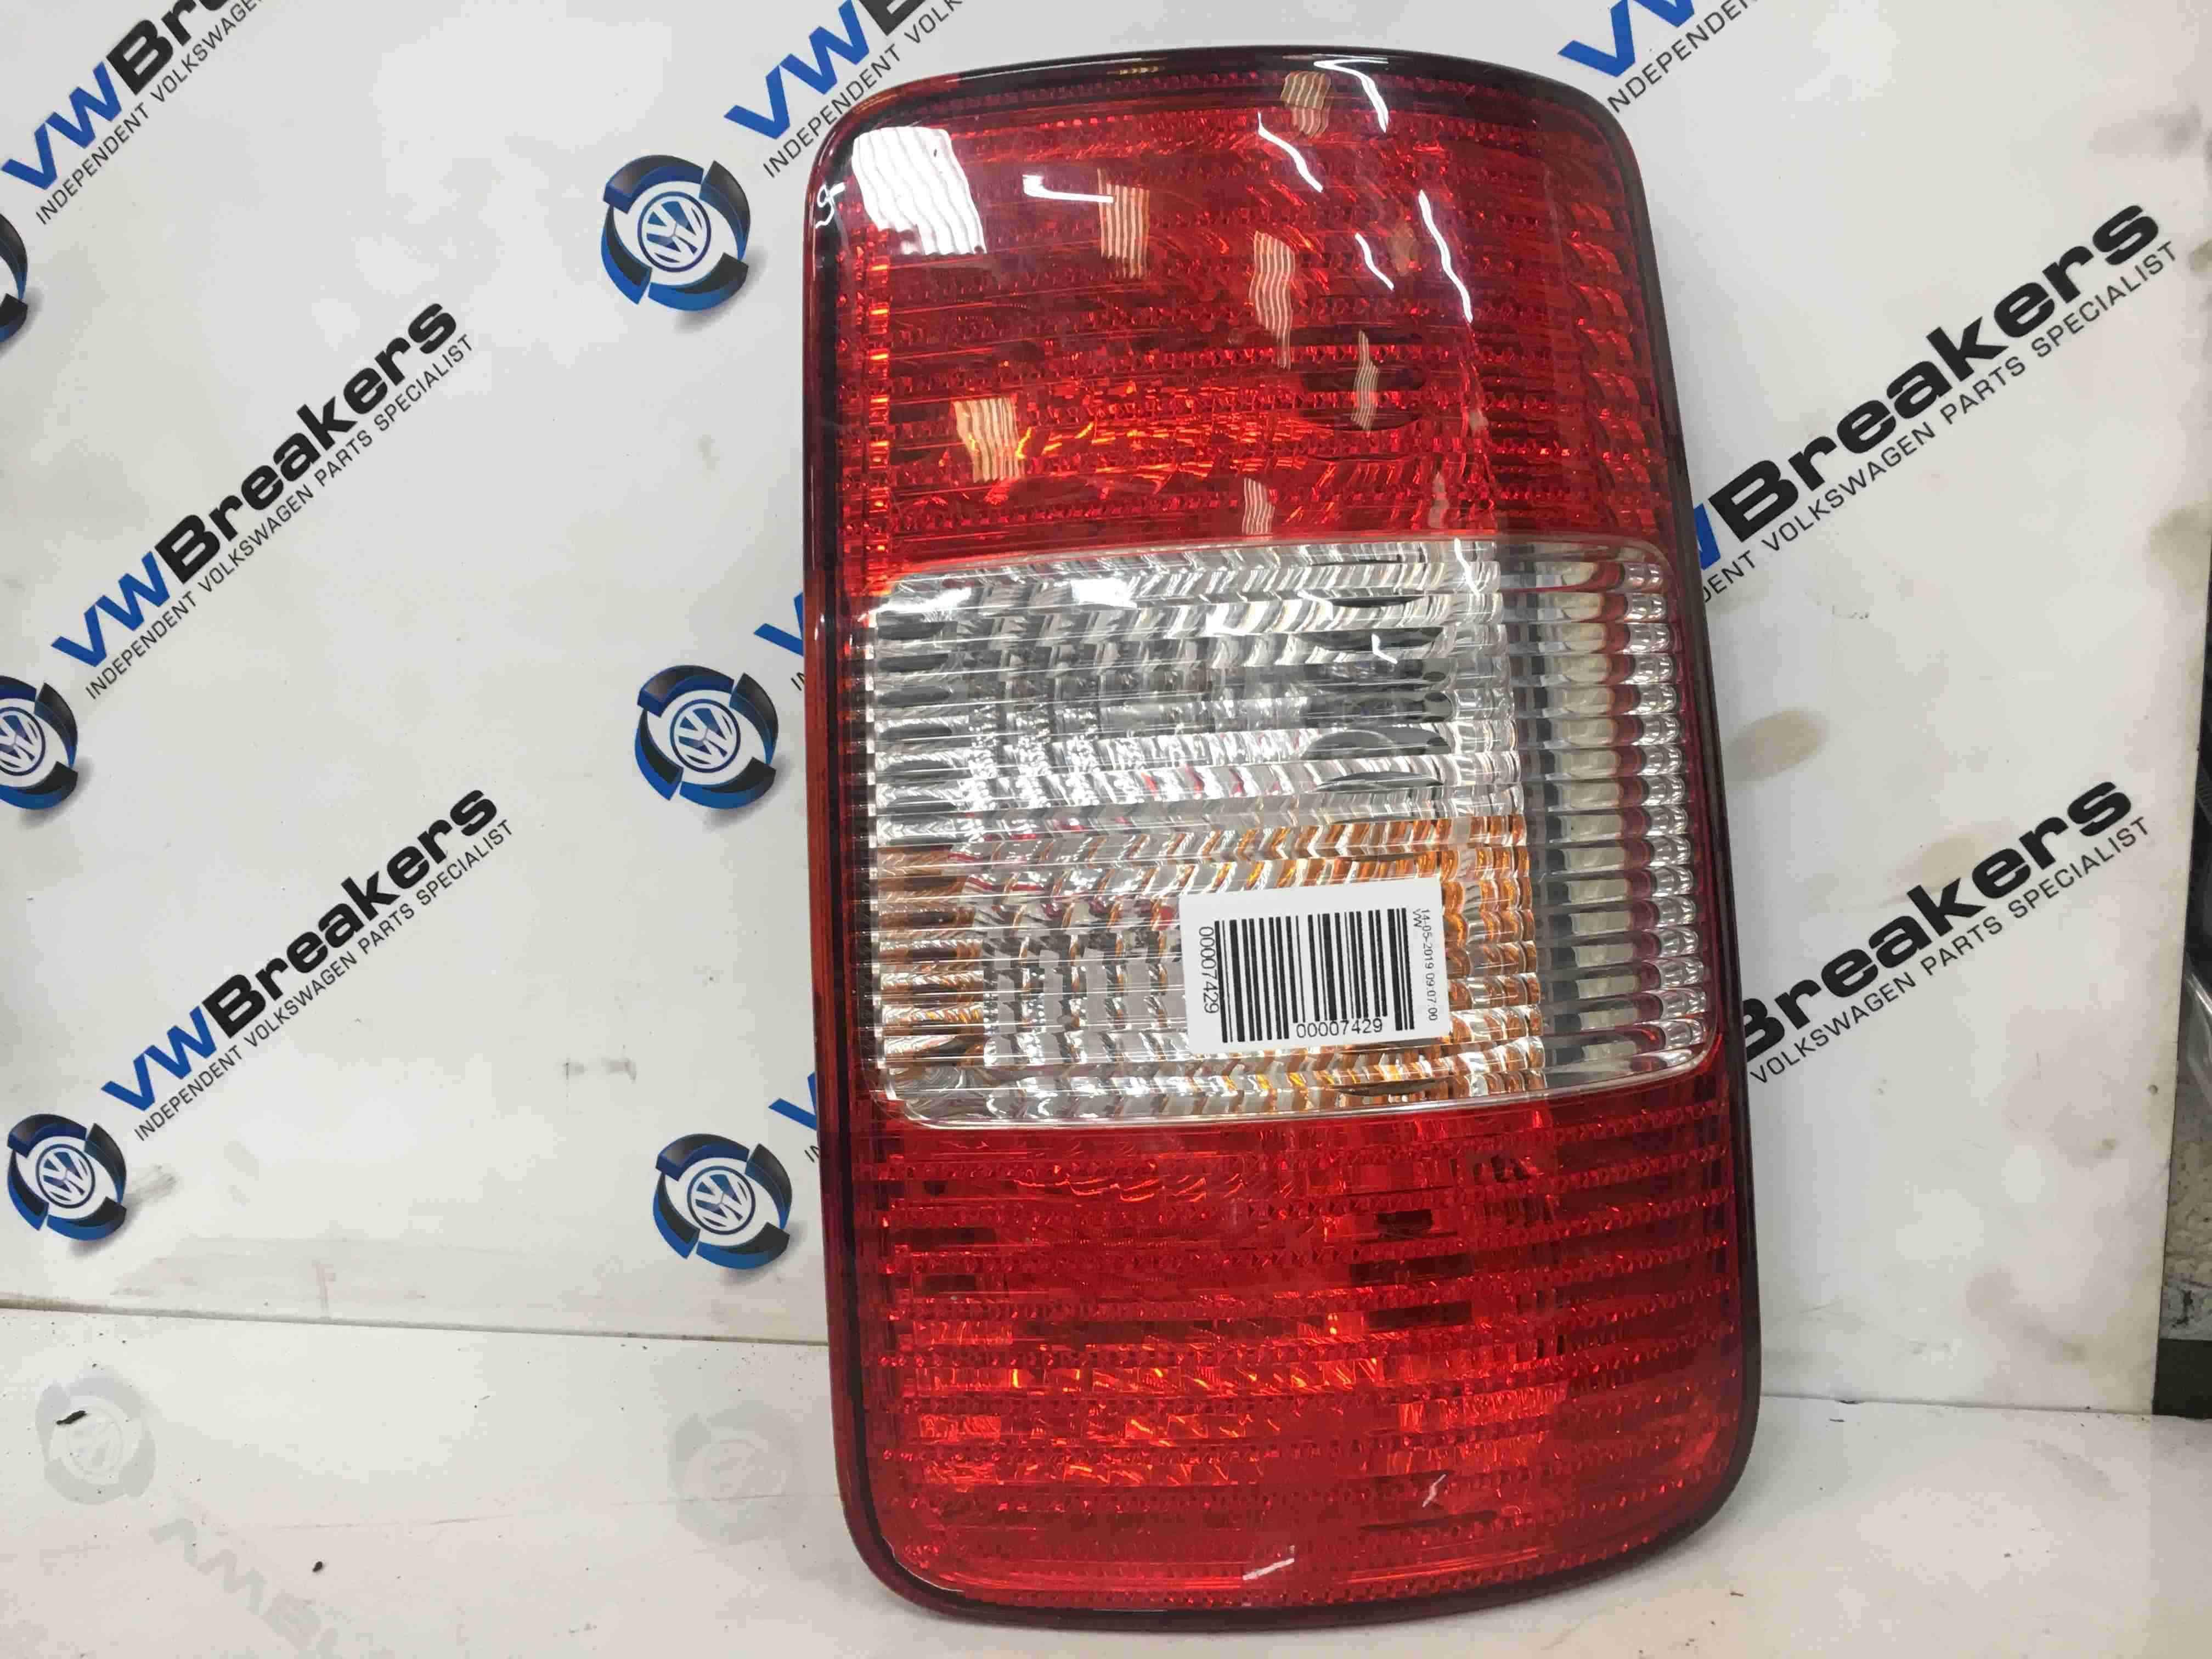 Volkswagen Caddy 2004-2010 Drivers OSR Rear Light 2K0945258A